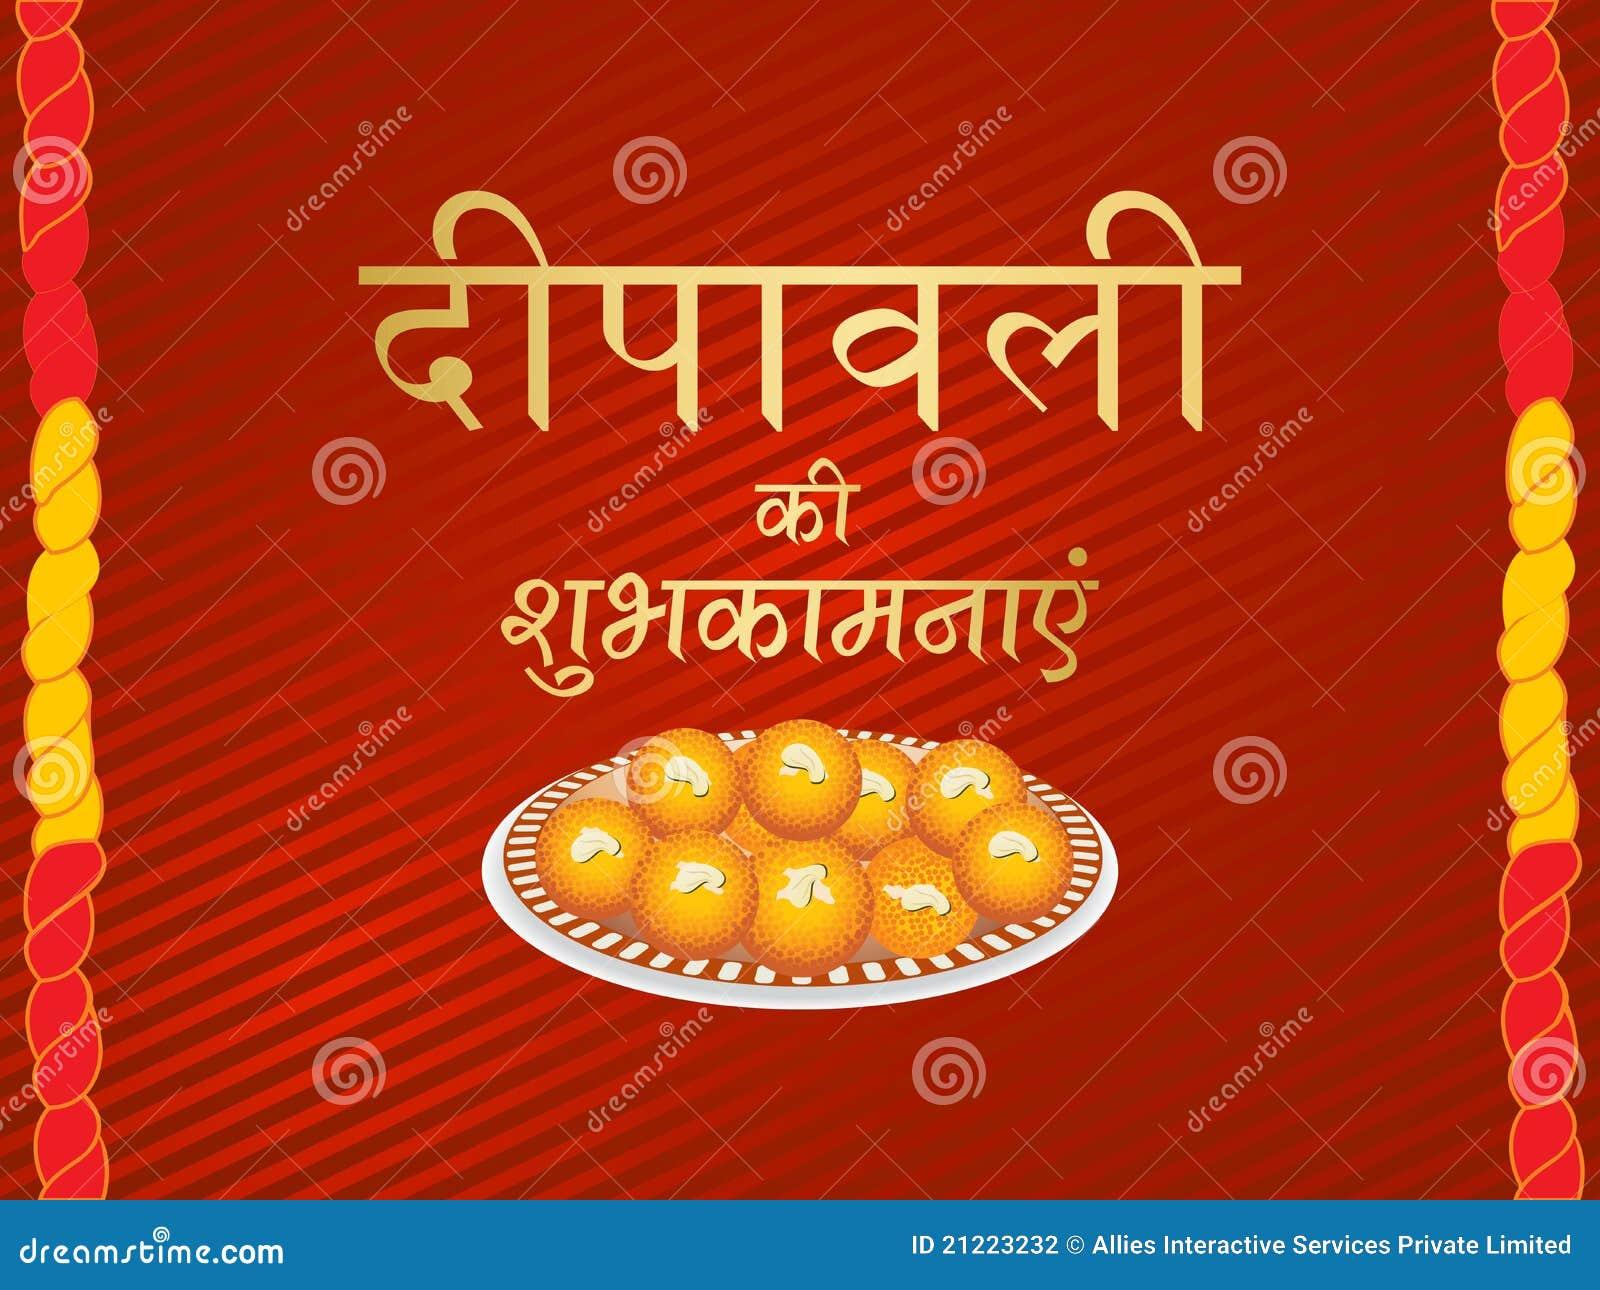 Elegant design card for indian festival diwali stock vector elegant design card for indian festival diwali m4hsunfo